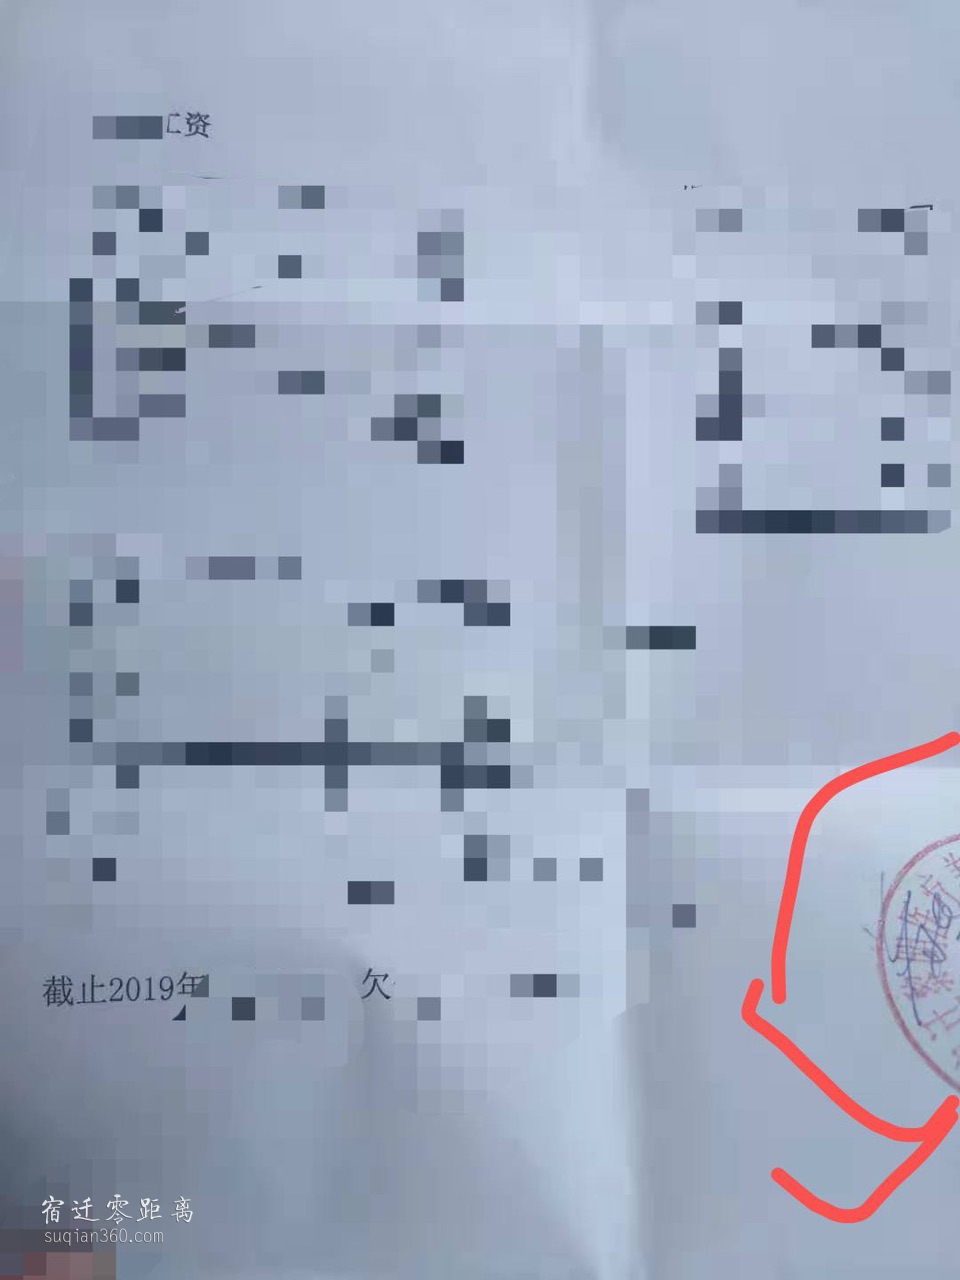 front1_0_Fq-_KUjHGrlwyHuS-H1zdSFBhC5x.1602939389.jpg